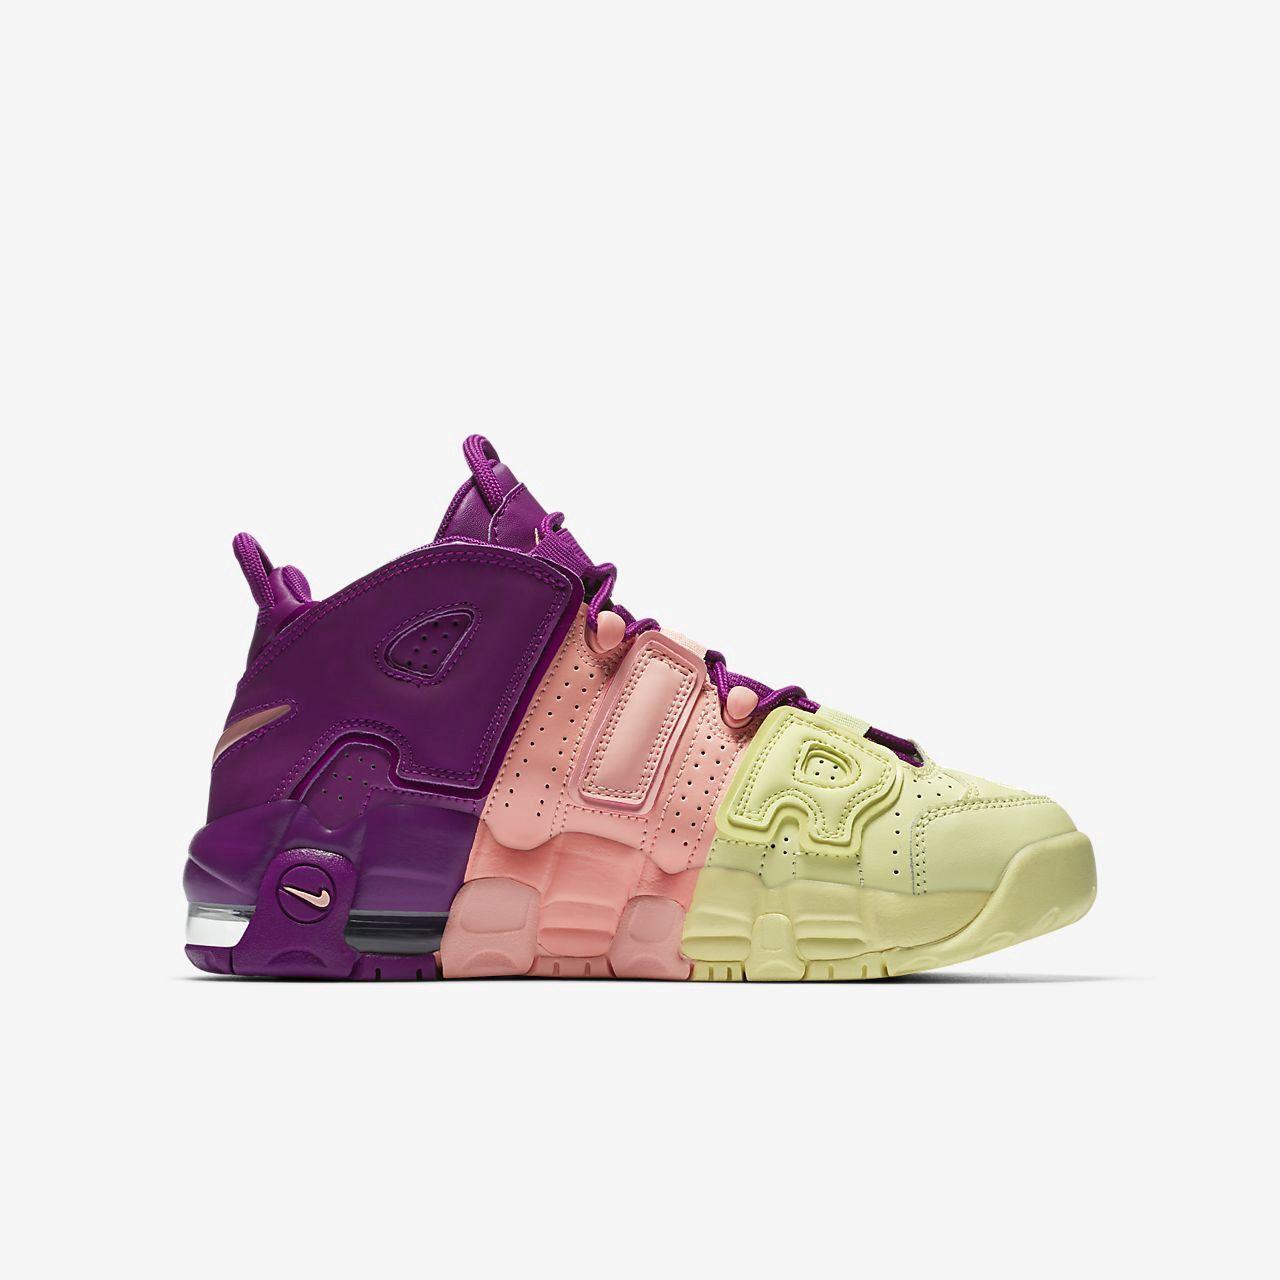 Nike Air More Uptempo Big Kids' Shoe 3.5Y Nike air